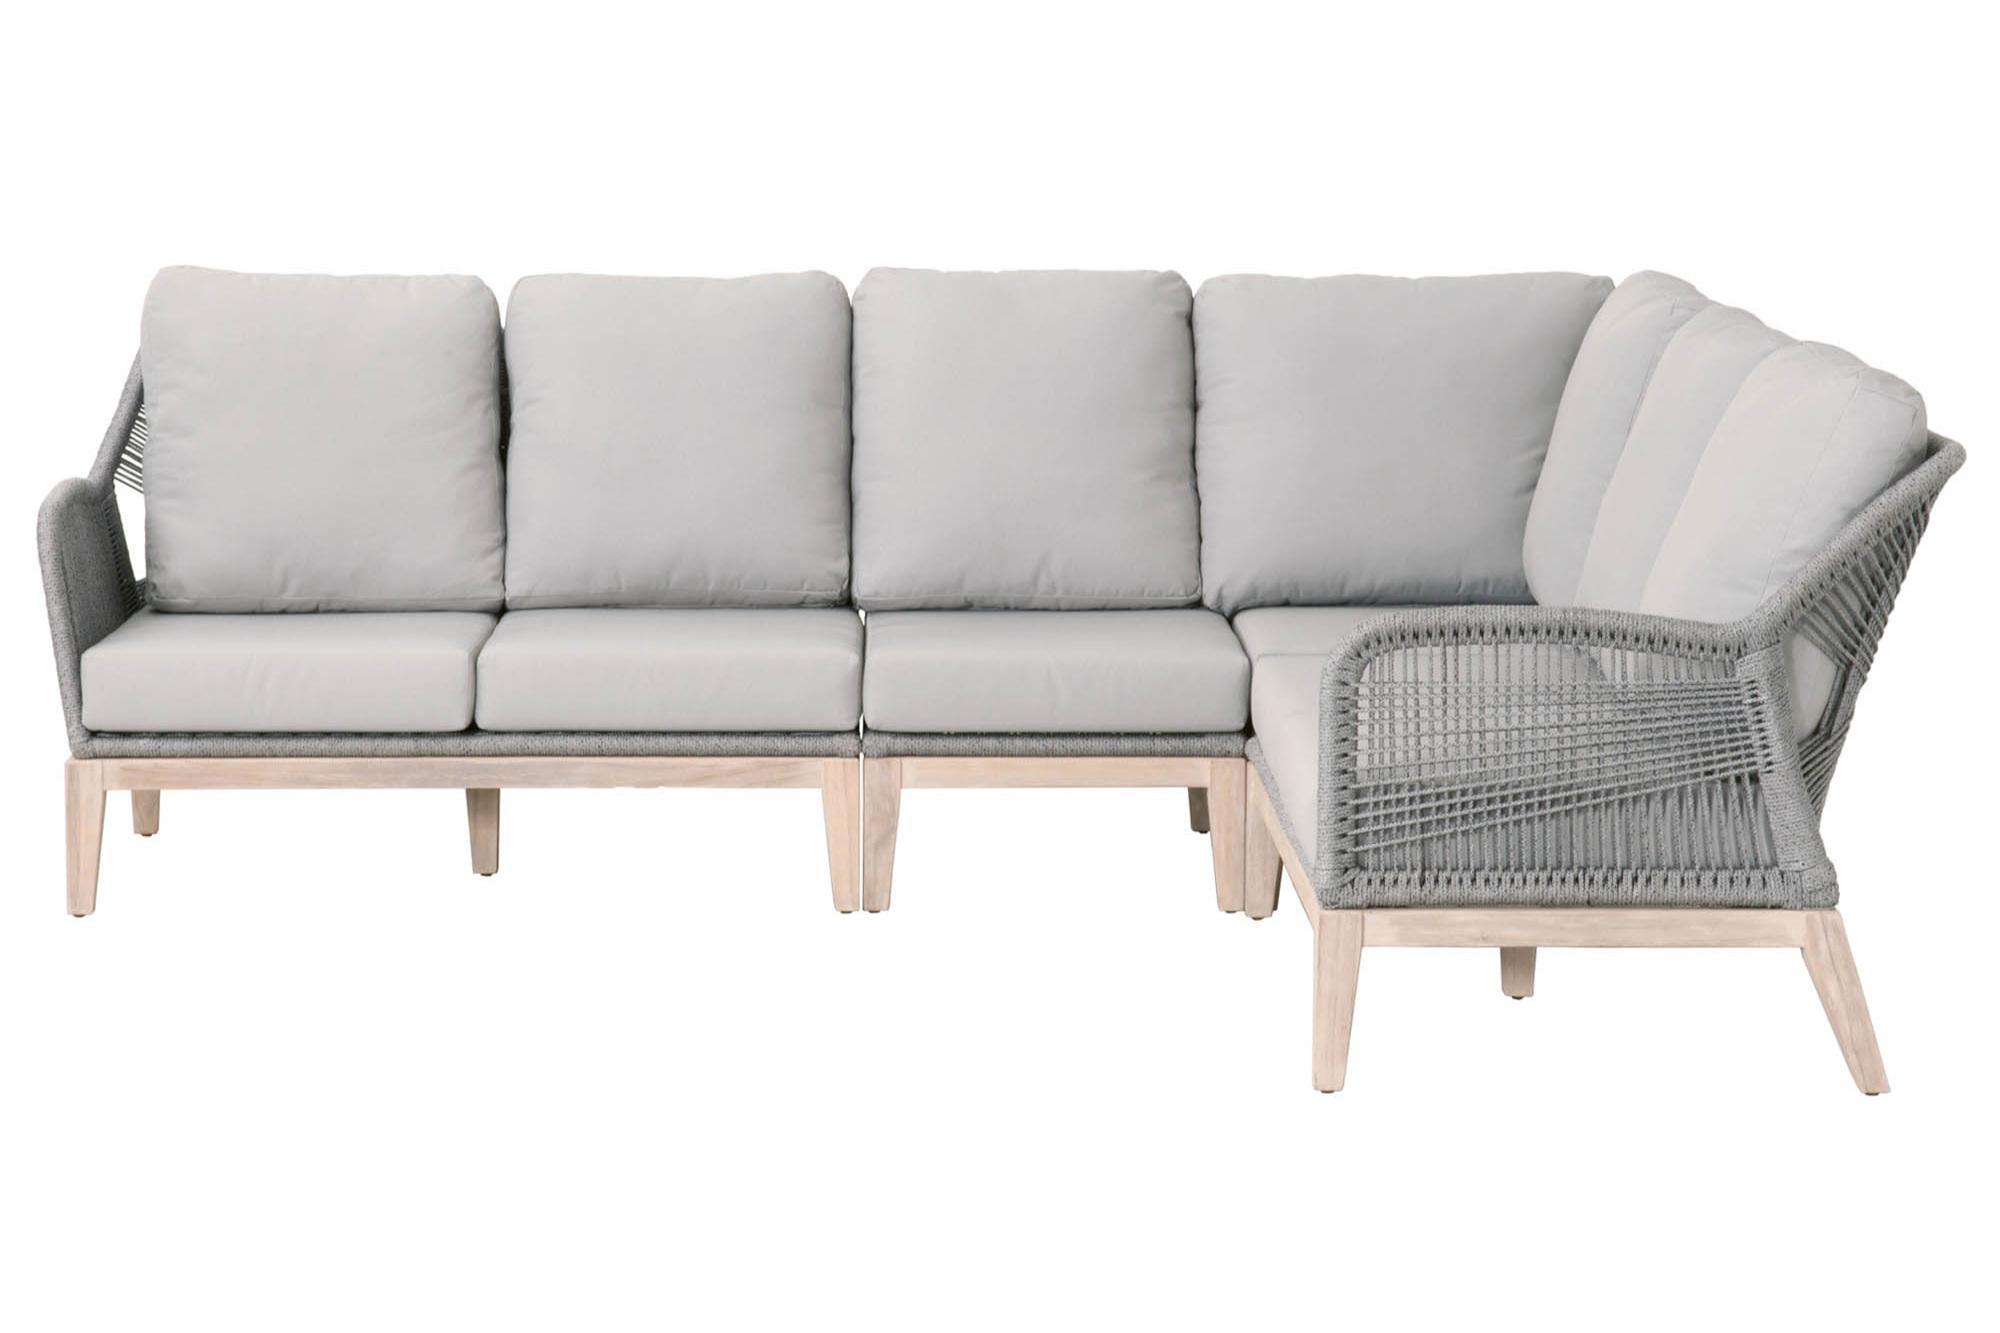 Loom+Outdoor+Modular+LF+2-Seat+Sofa+-+Platinum+-+5.jpg